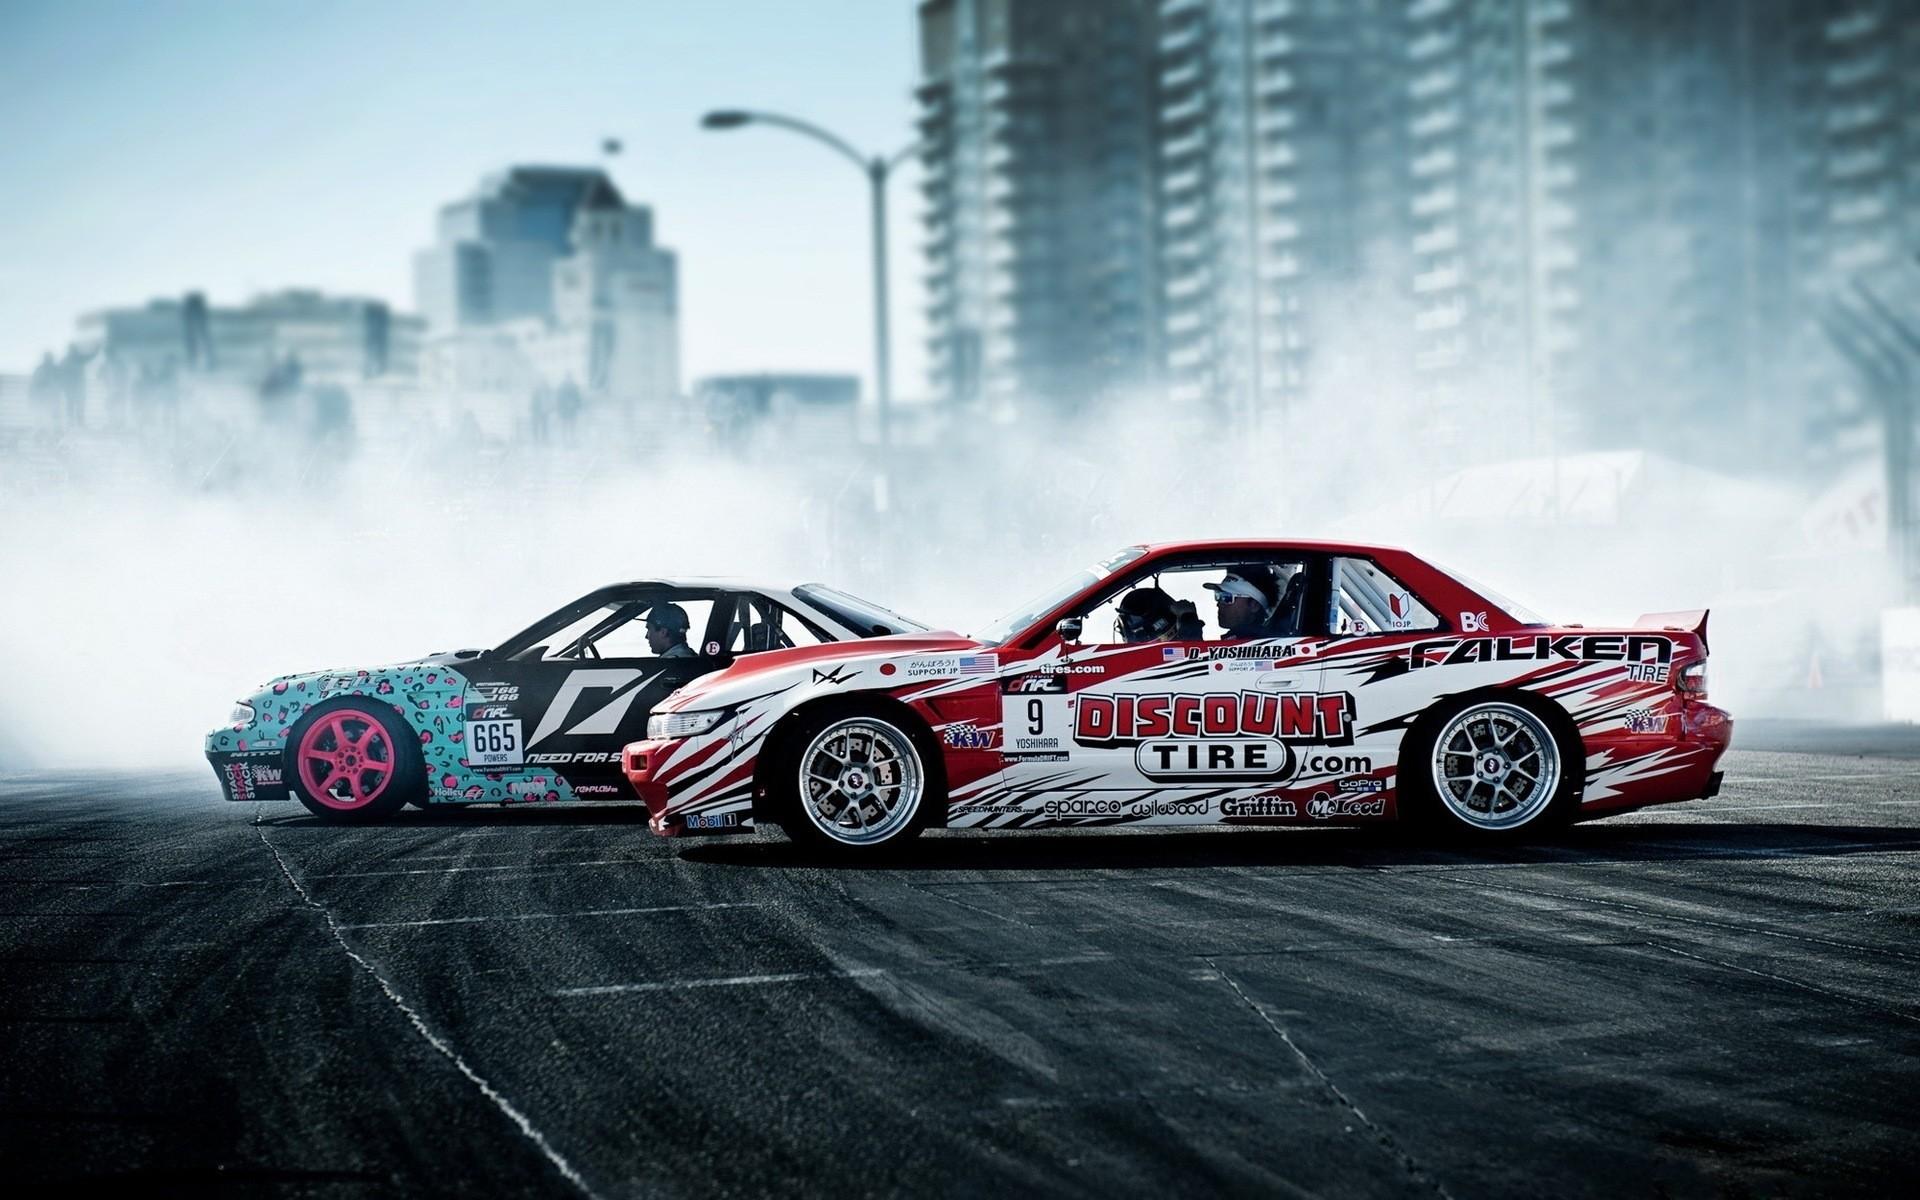 Jdm Wallpaper Nissan. cars nissan drifting races games nissan 200sx nissan  silvia s13 jdm nissan